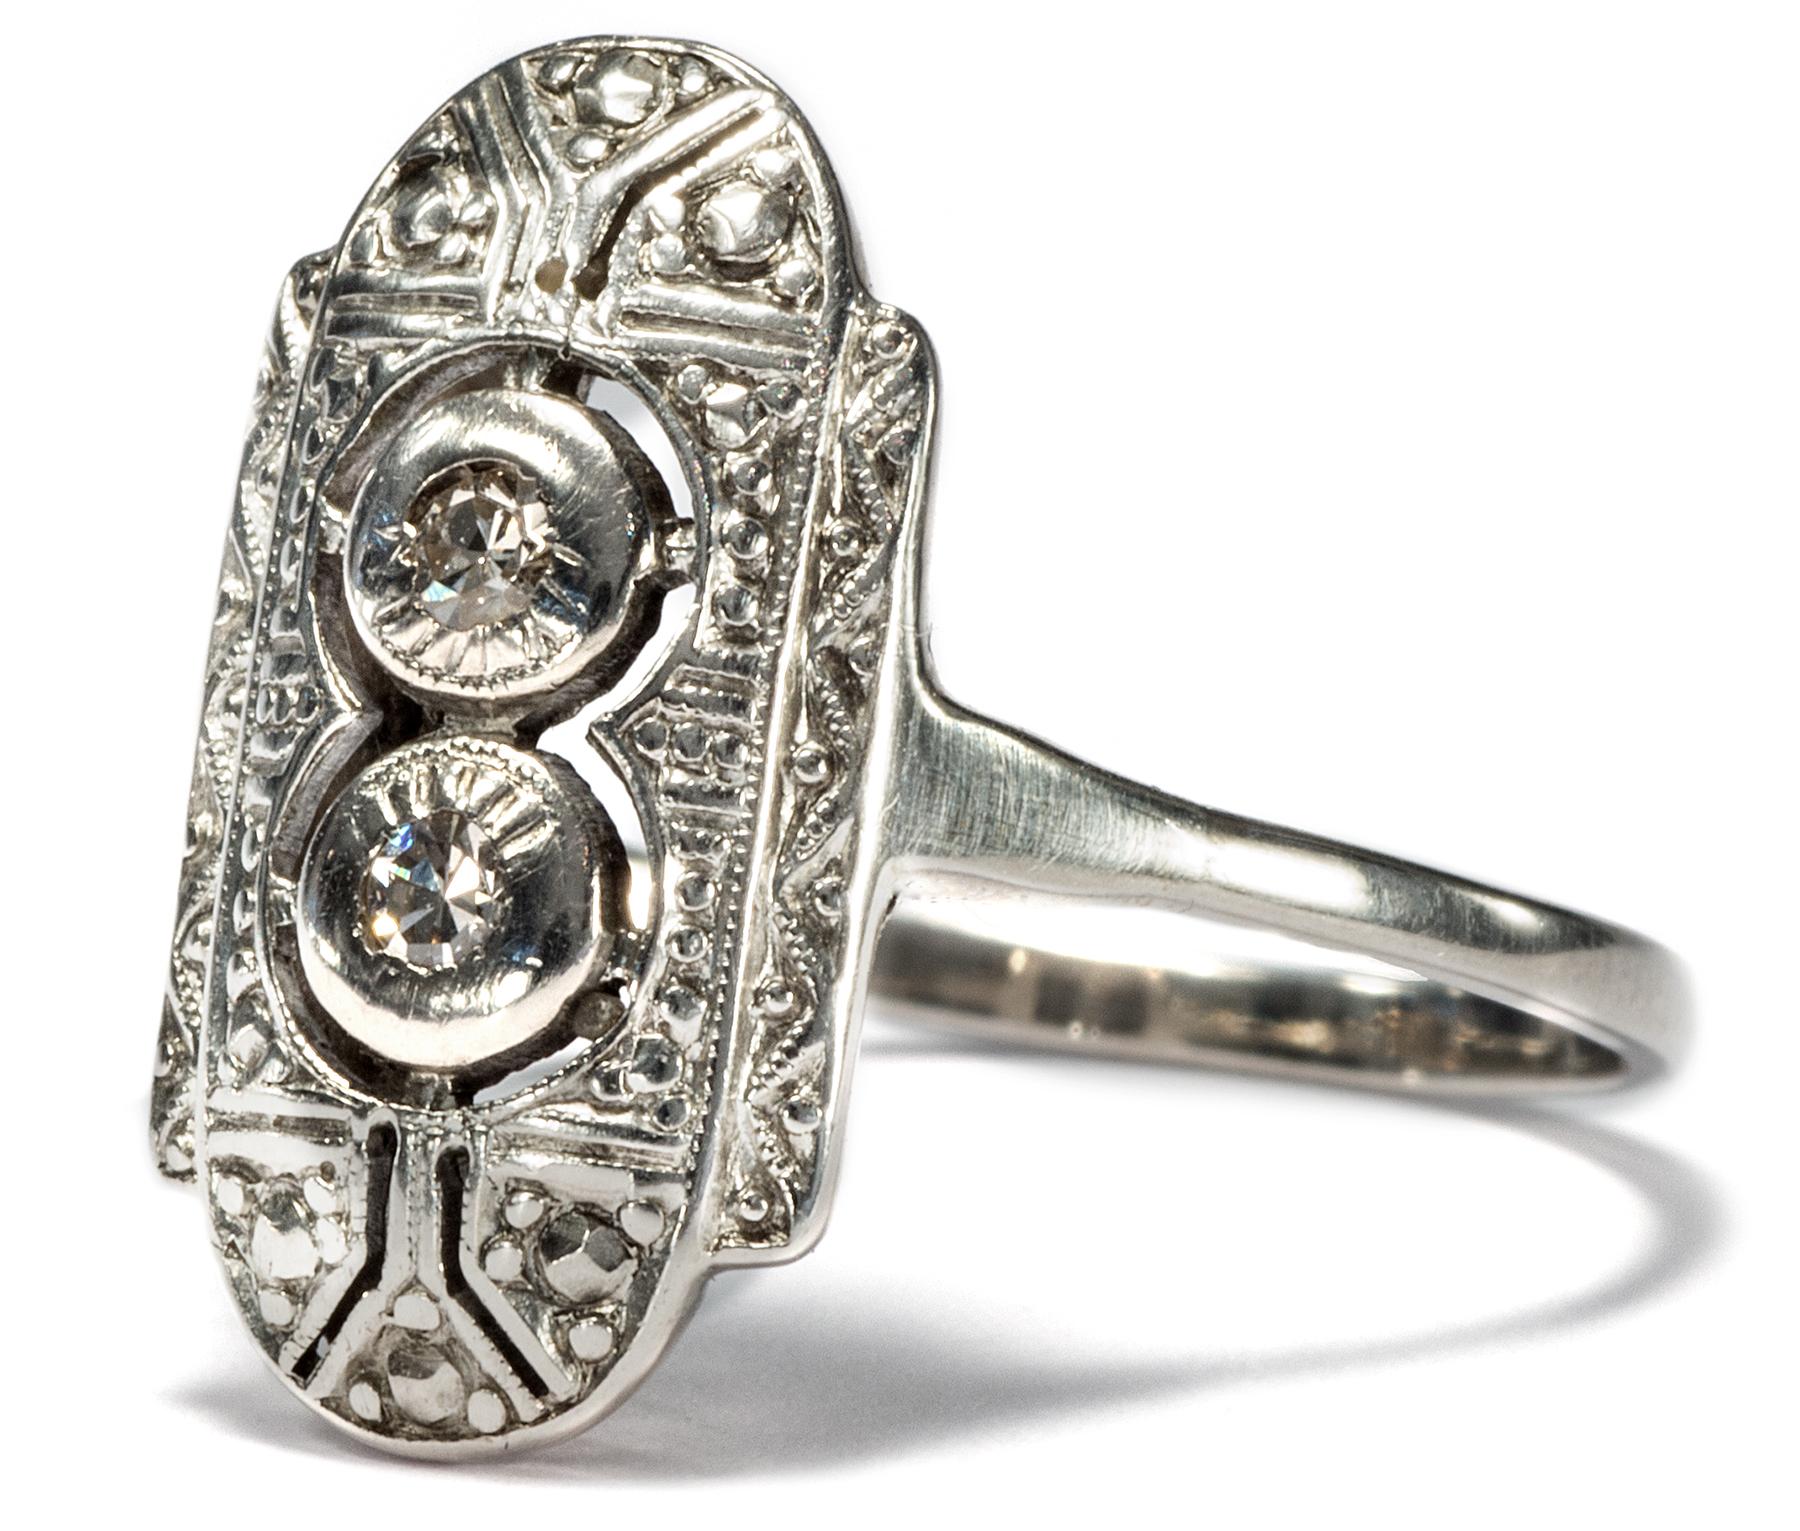 sch ner antiker art d co diamant ring um 1920 silber diamanten schiffchenring ebay. Black Bedroom Furniture Sets. Home Design Ideas